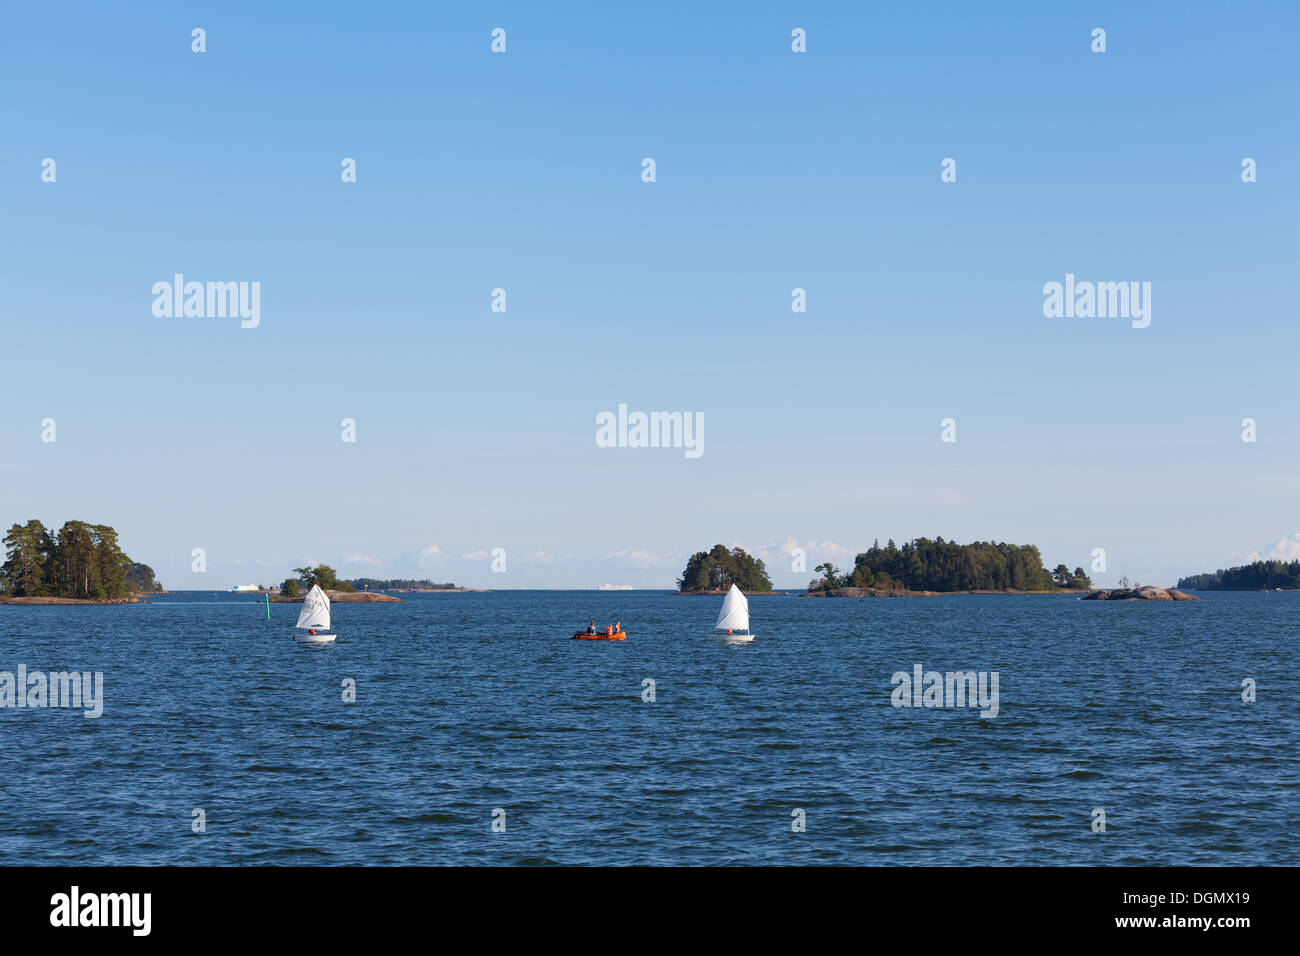 Optimist dinghy - Stock Image